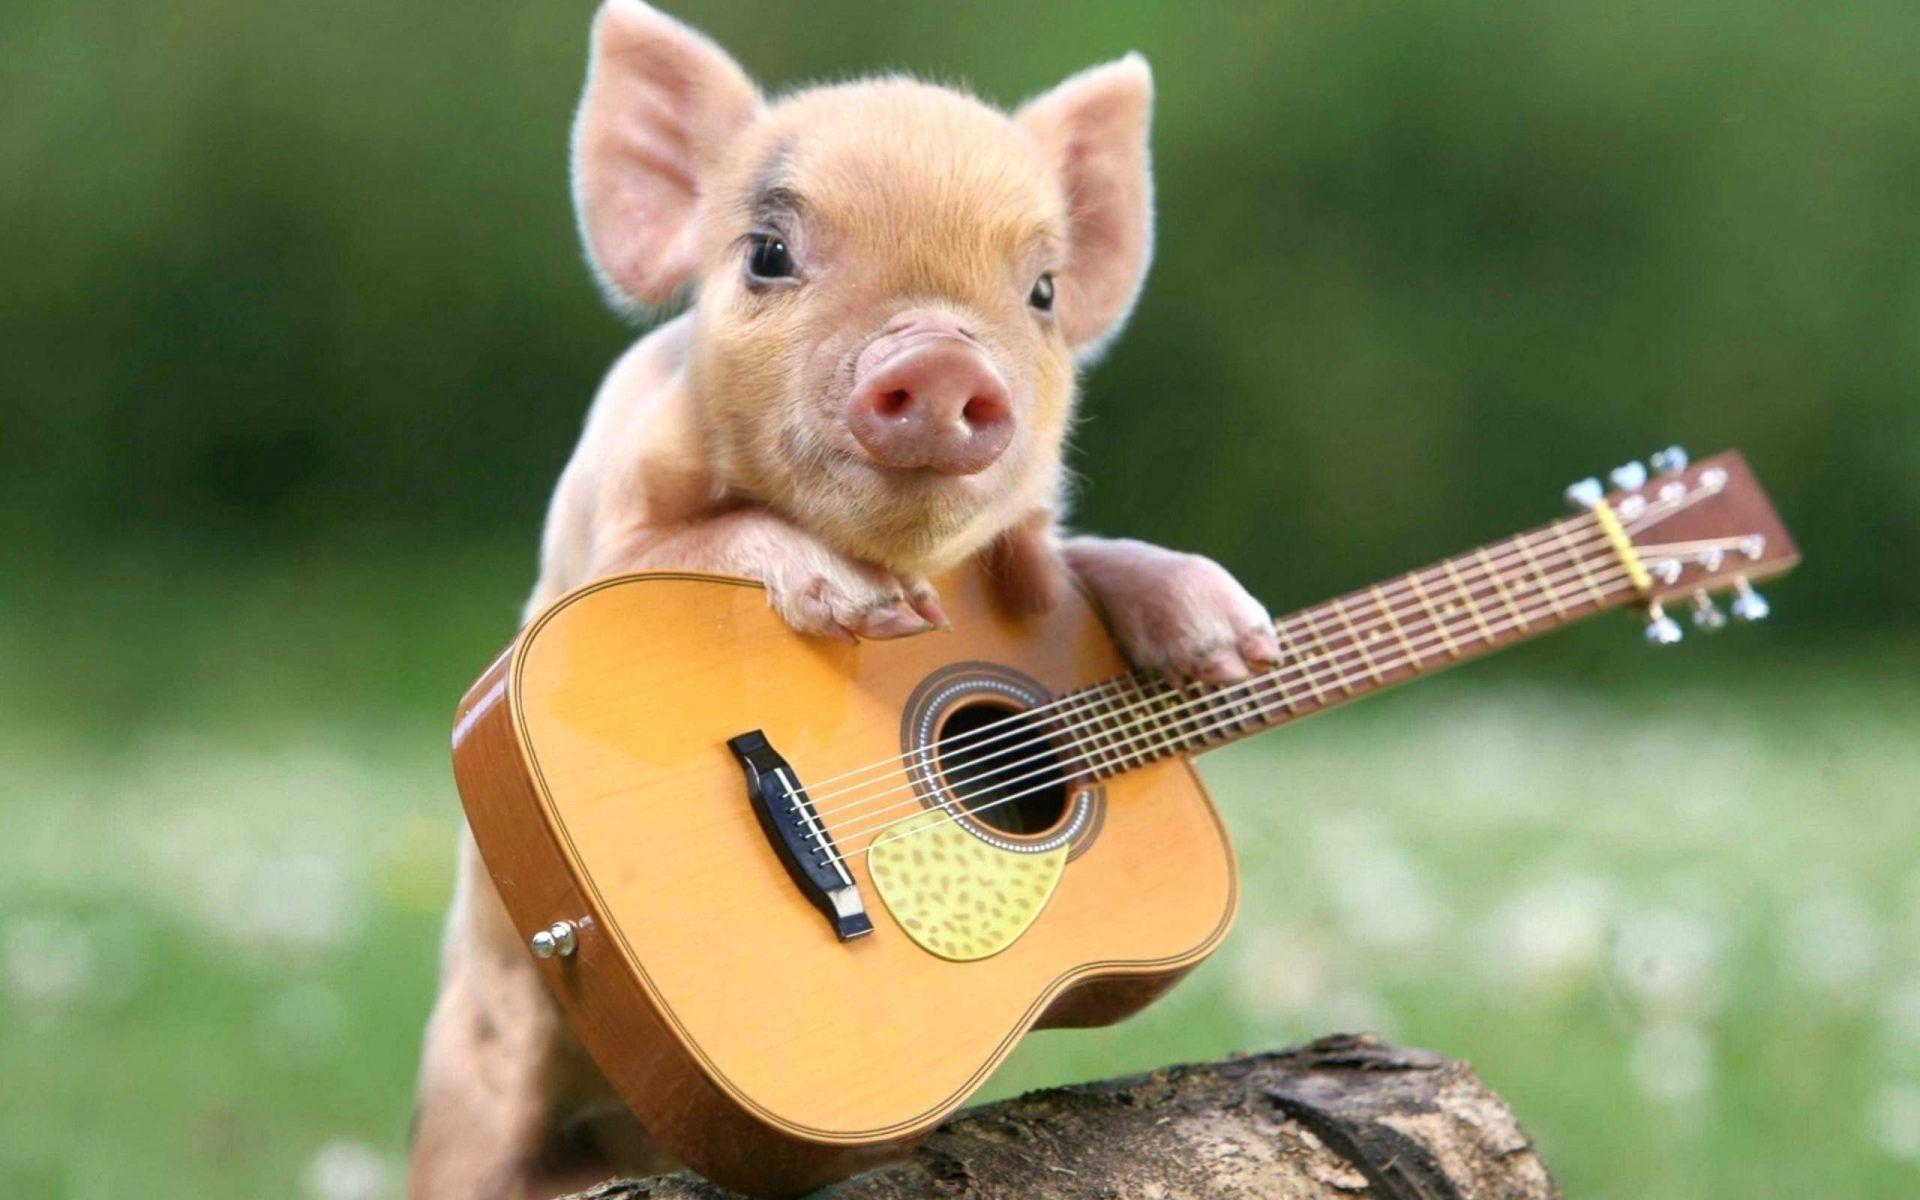 Cute Pig Wallpaper HD Download For Desktop Of Little Cute Piglet